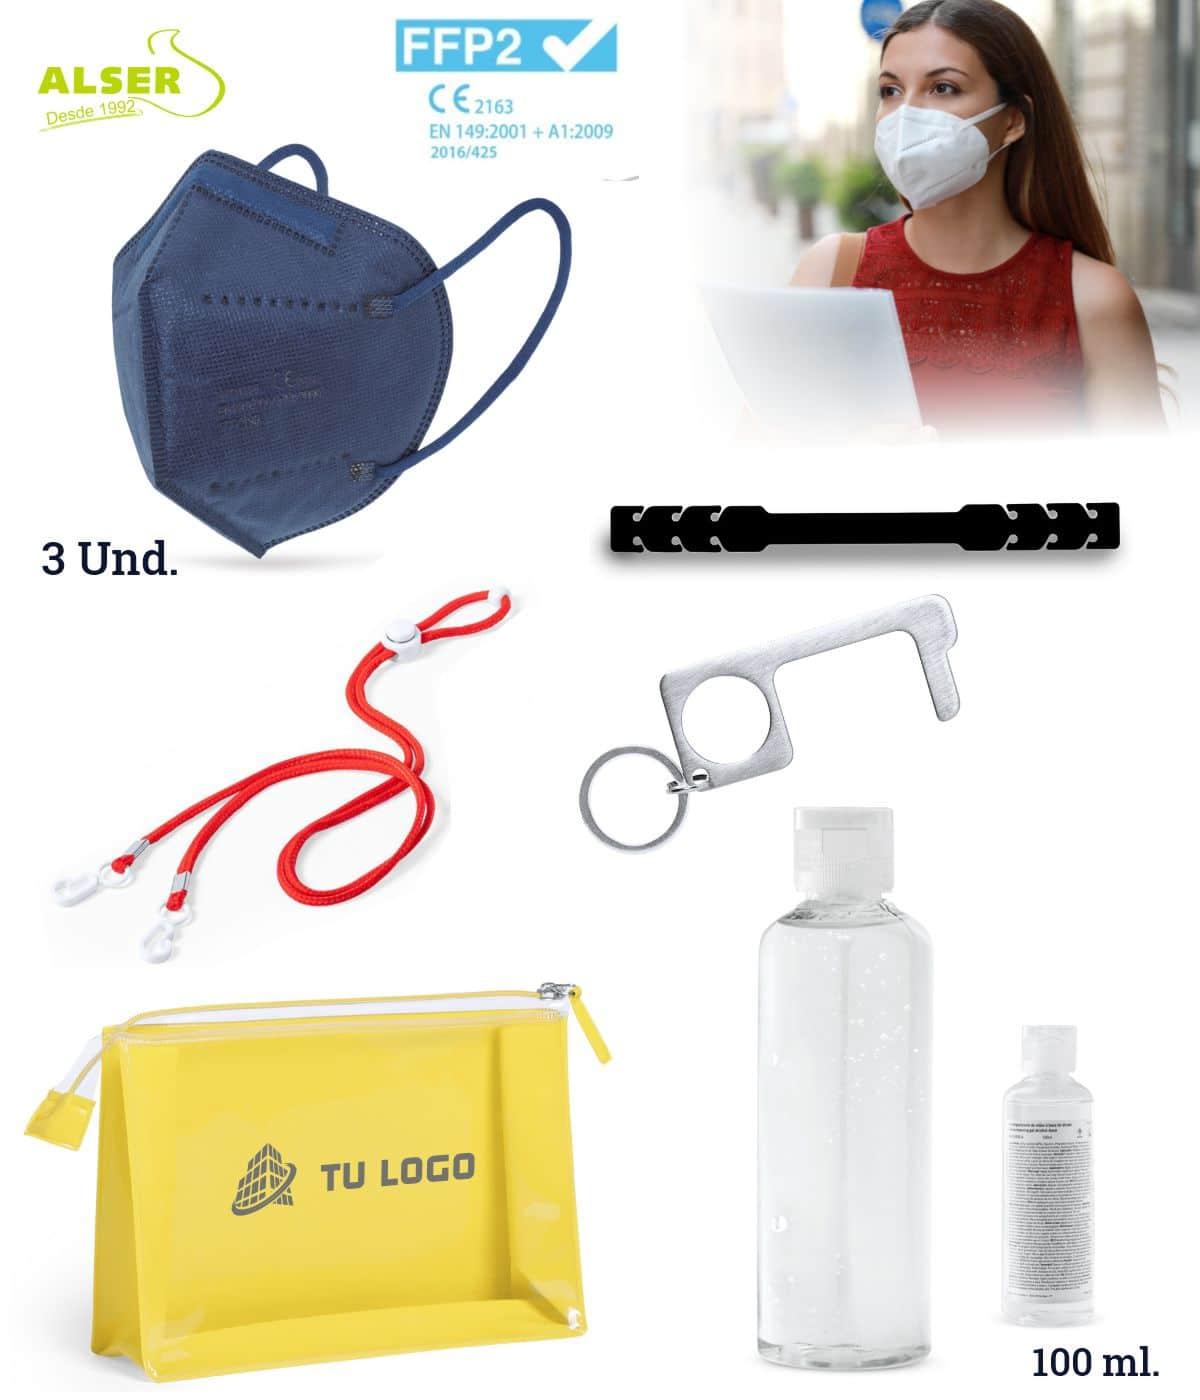 Set higiénico para trabajadores